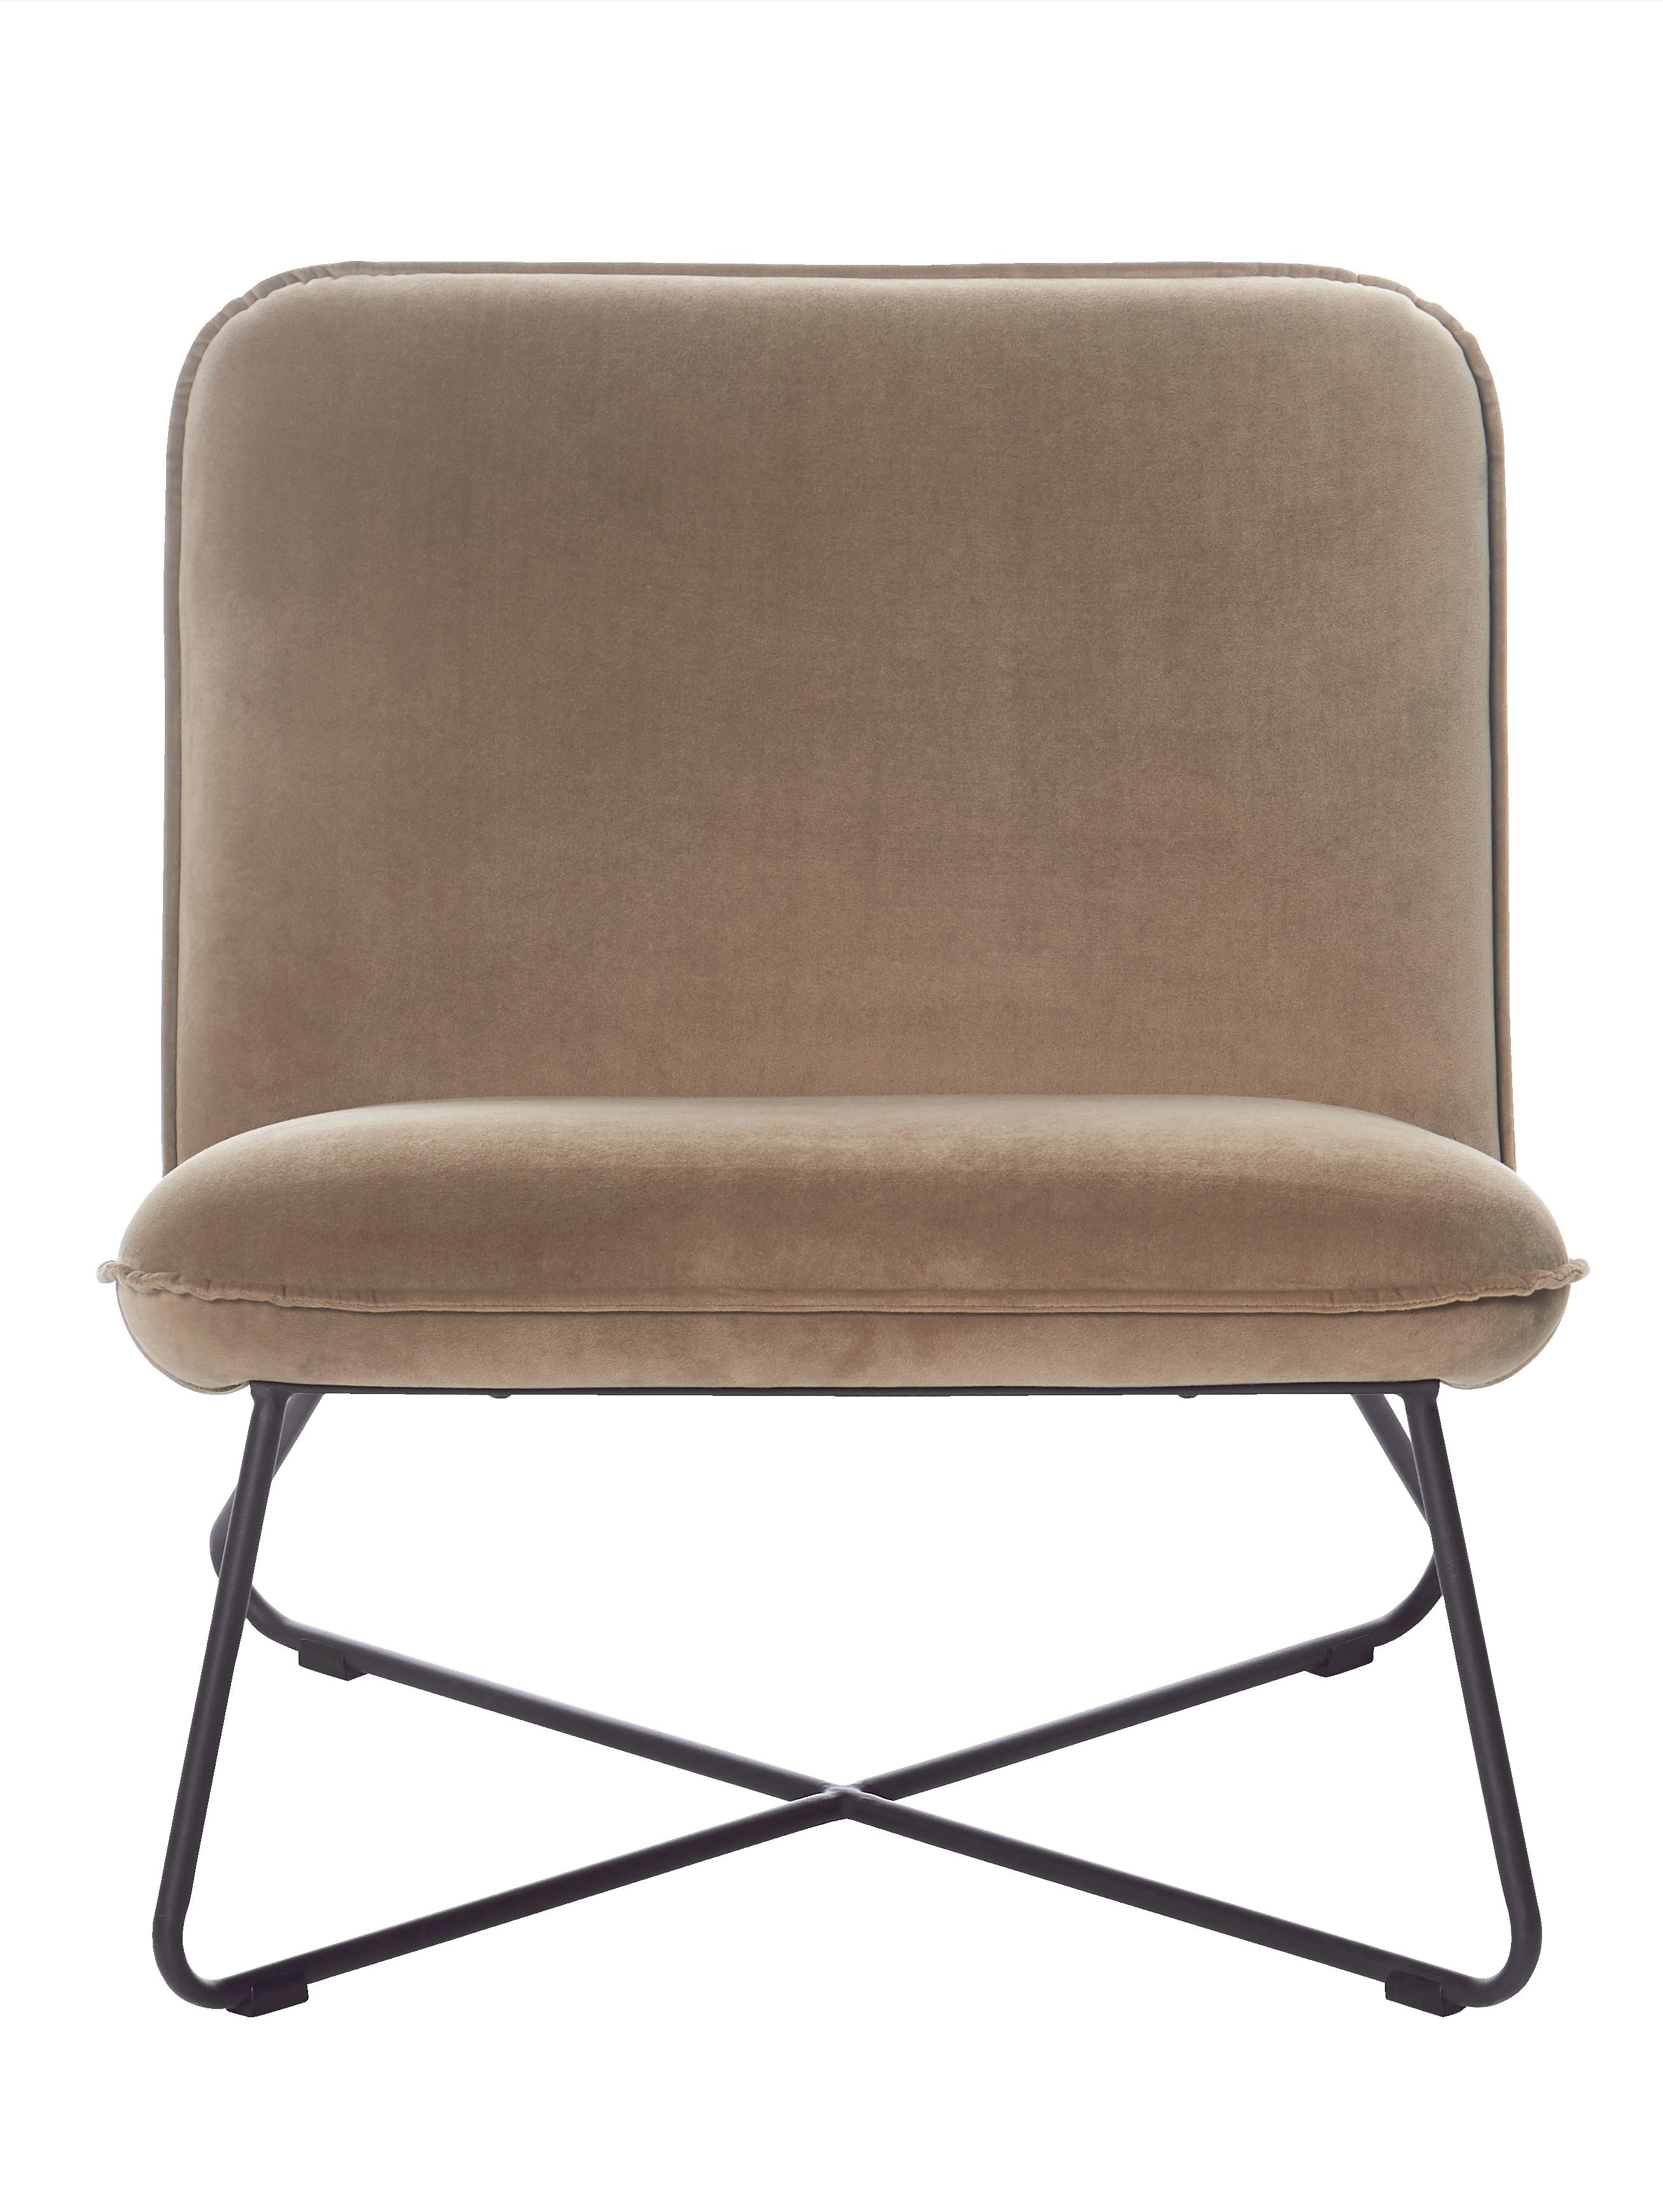 Interior Mobel Impressionen Living Sessel Metall Stoff